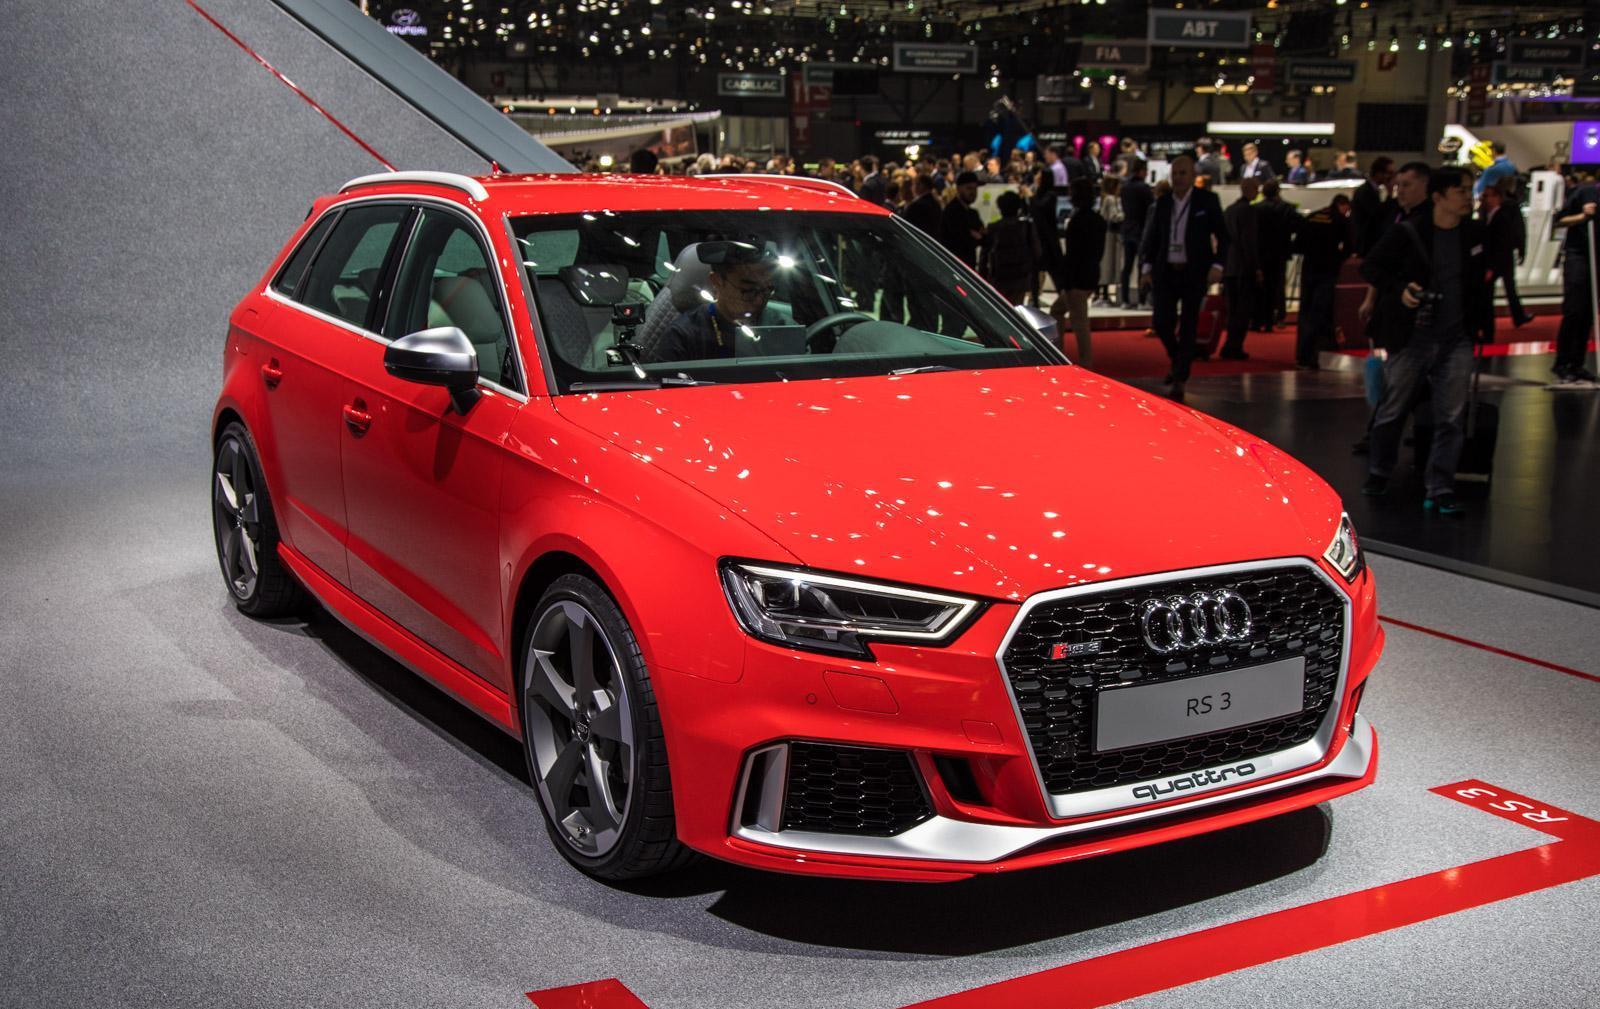 Audi-rs3-sportback-facelift-006